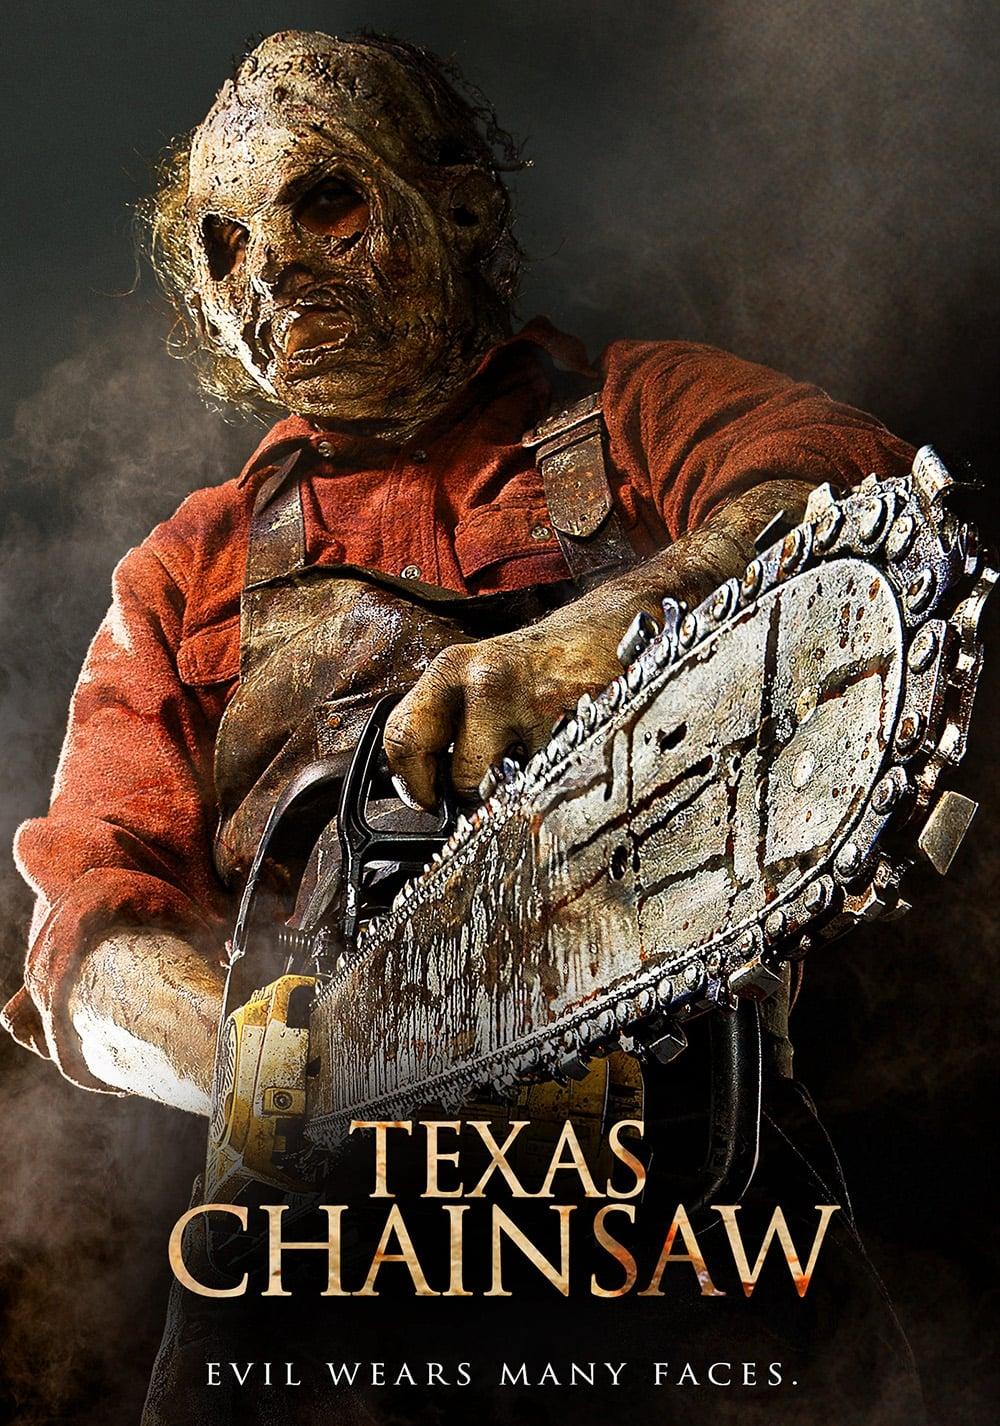 Massacre-La-Trononneuse-Texas-Chainsaw-2013-5654